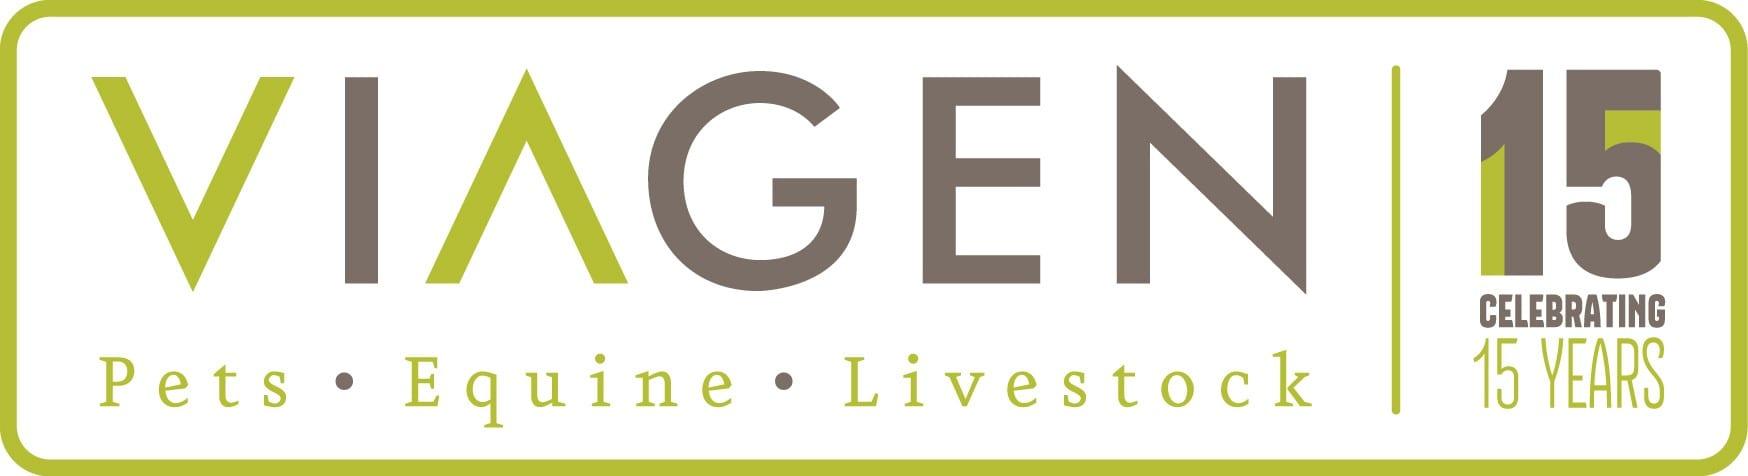 logo Viagen